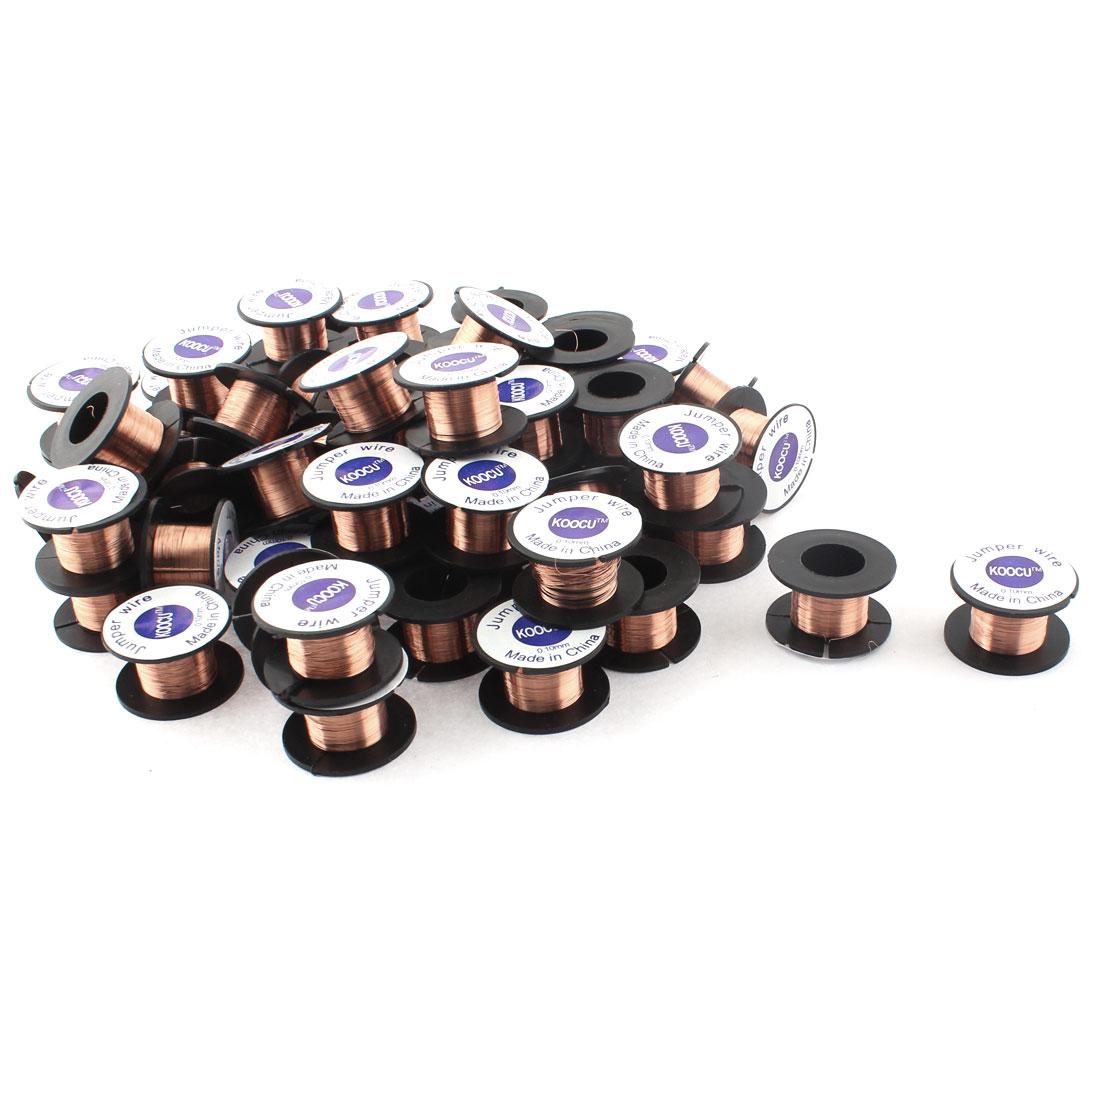 0.1mm Dia Jewelery Scrap Repair Enamelled Soldering Solder Wire Reel 60pcs